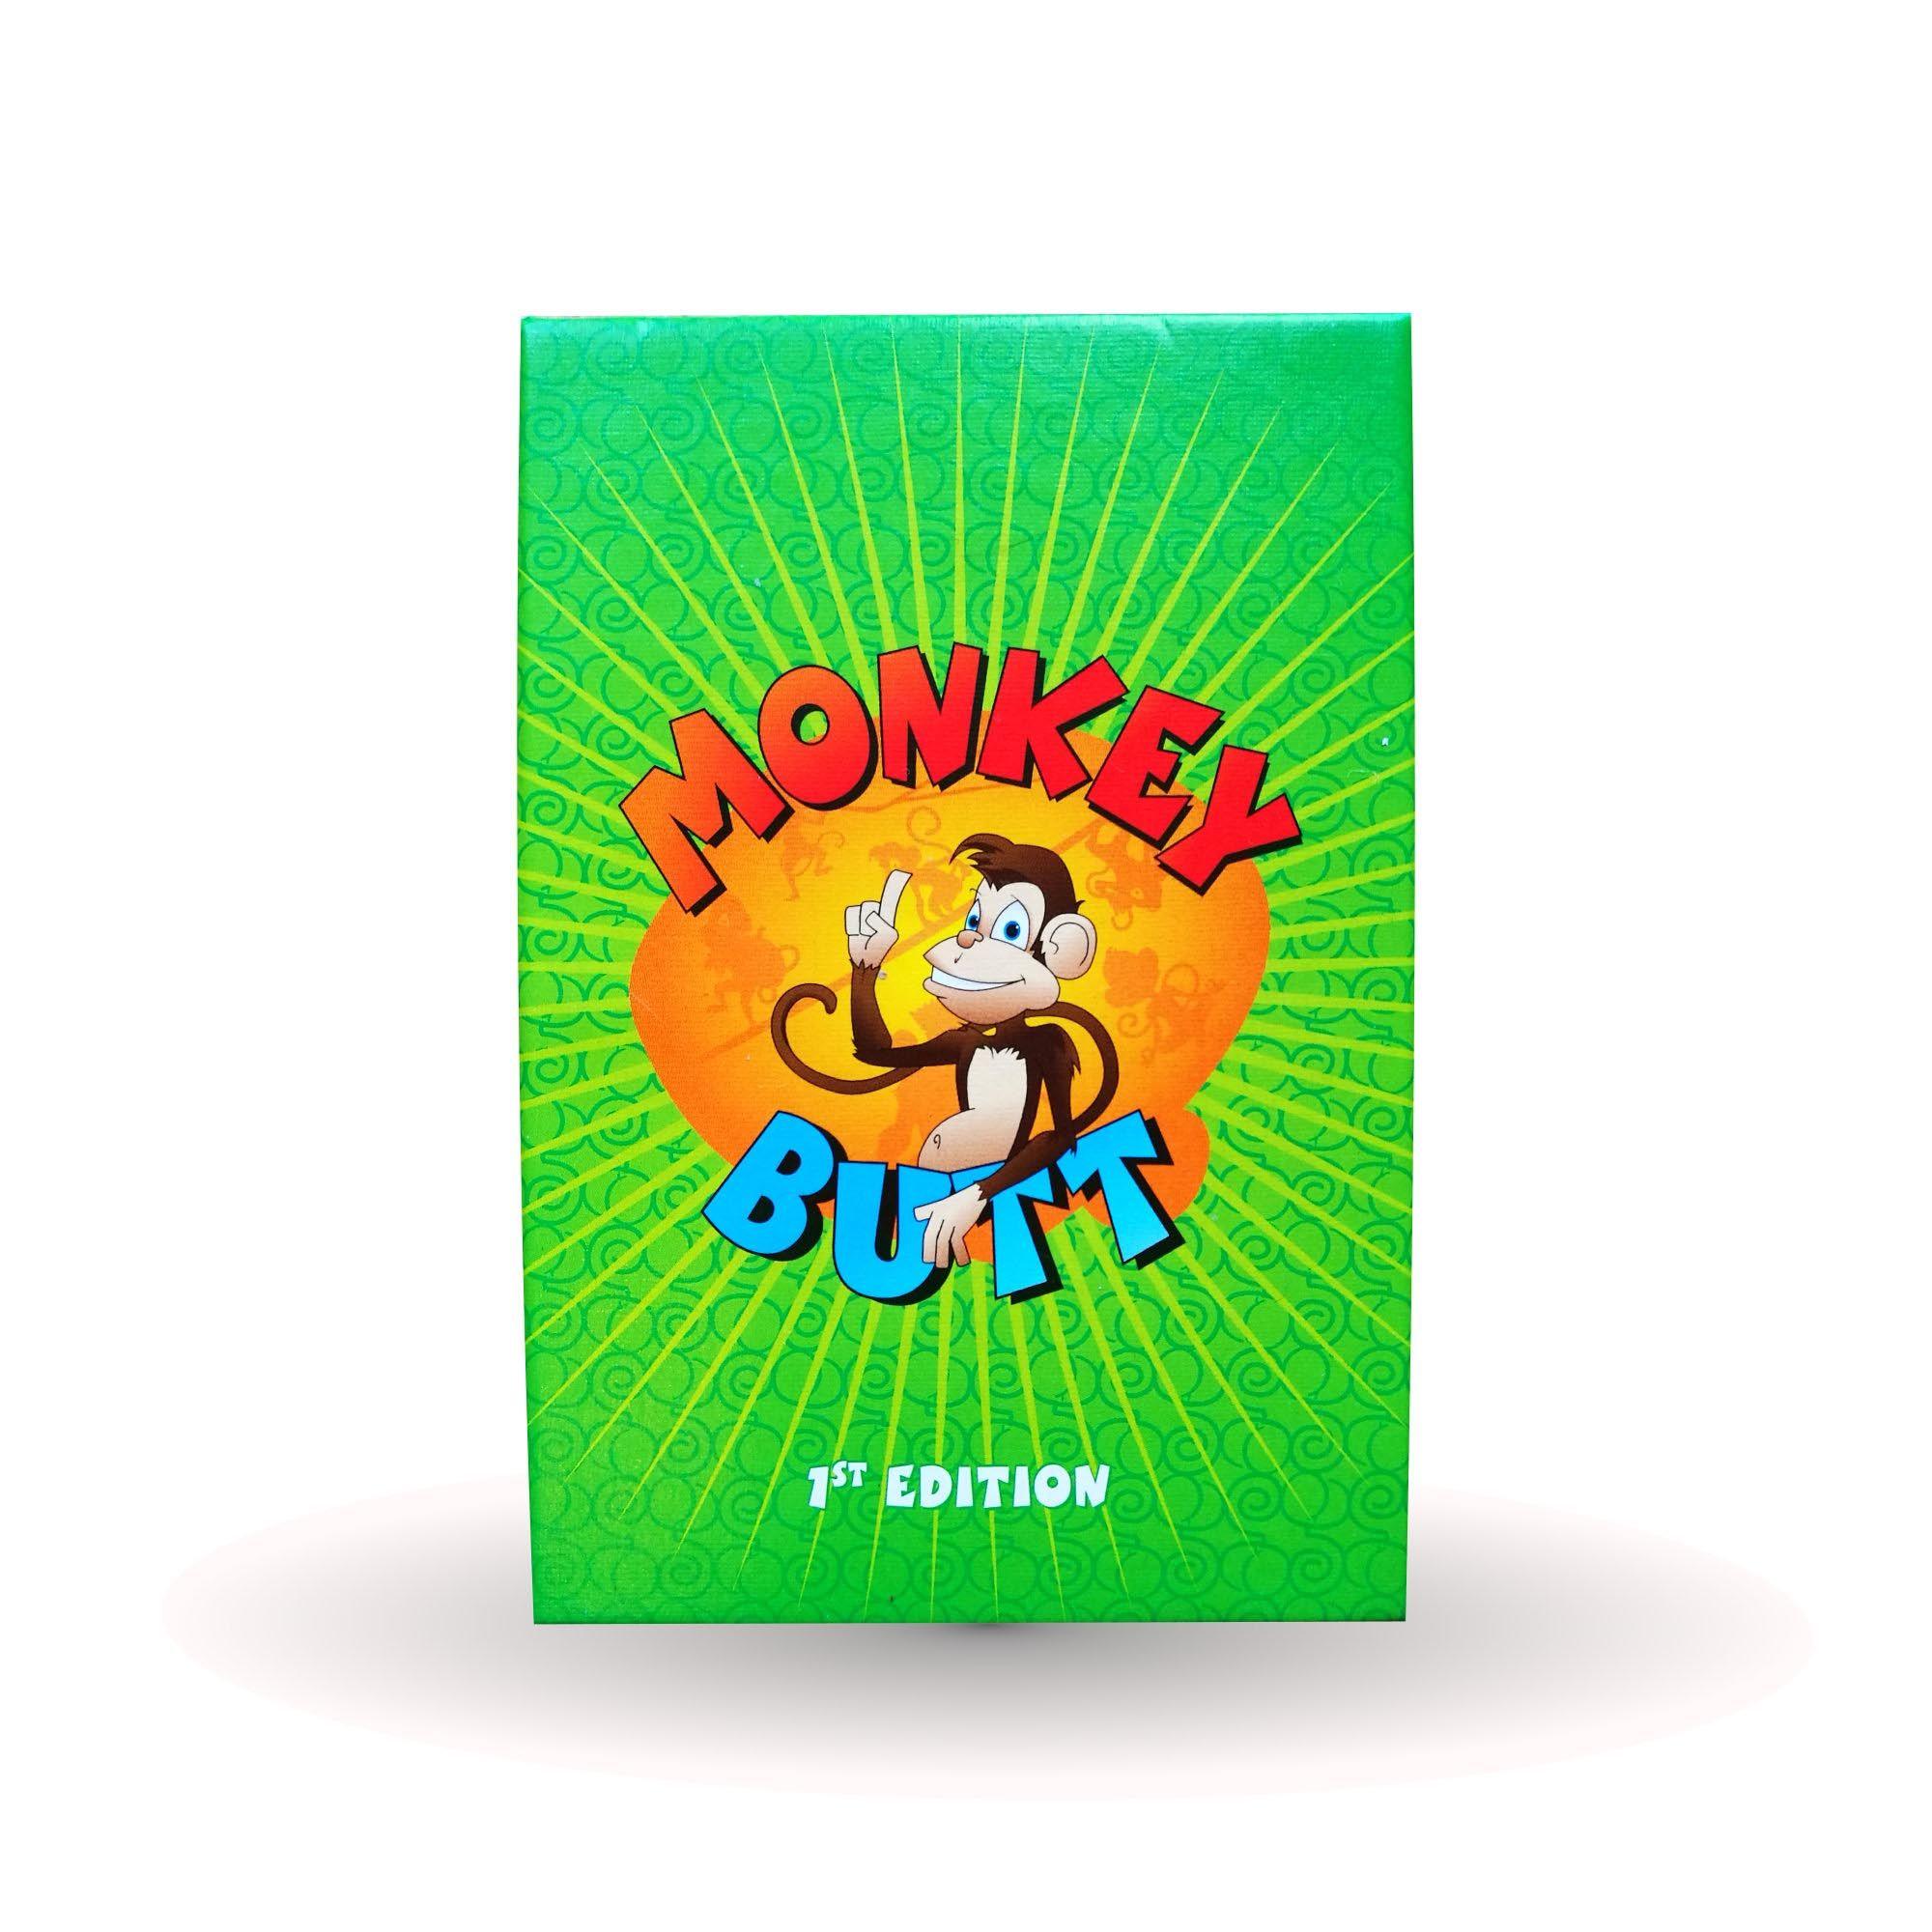 настольная игра Monkey Butt Обезьяна прикладом